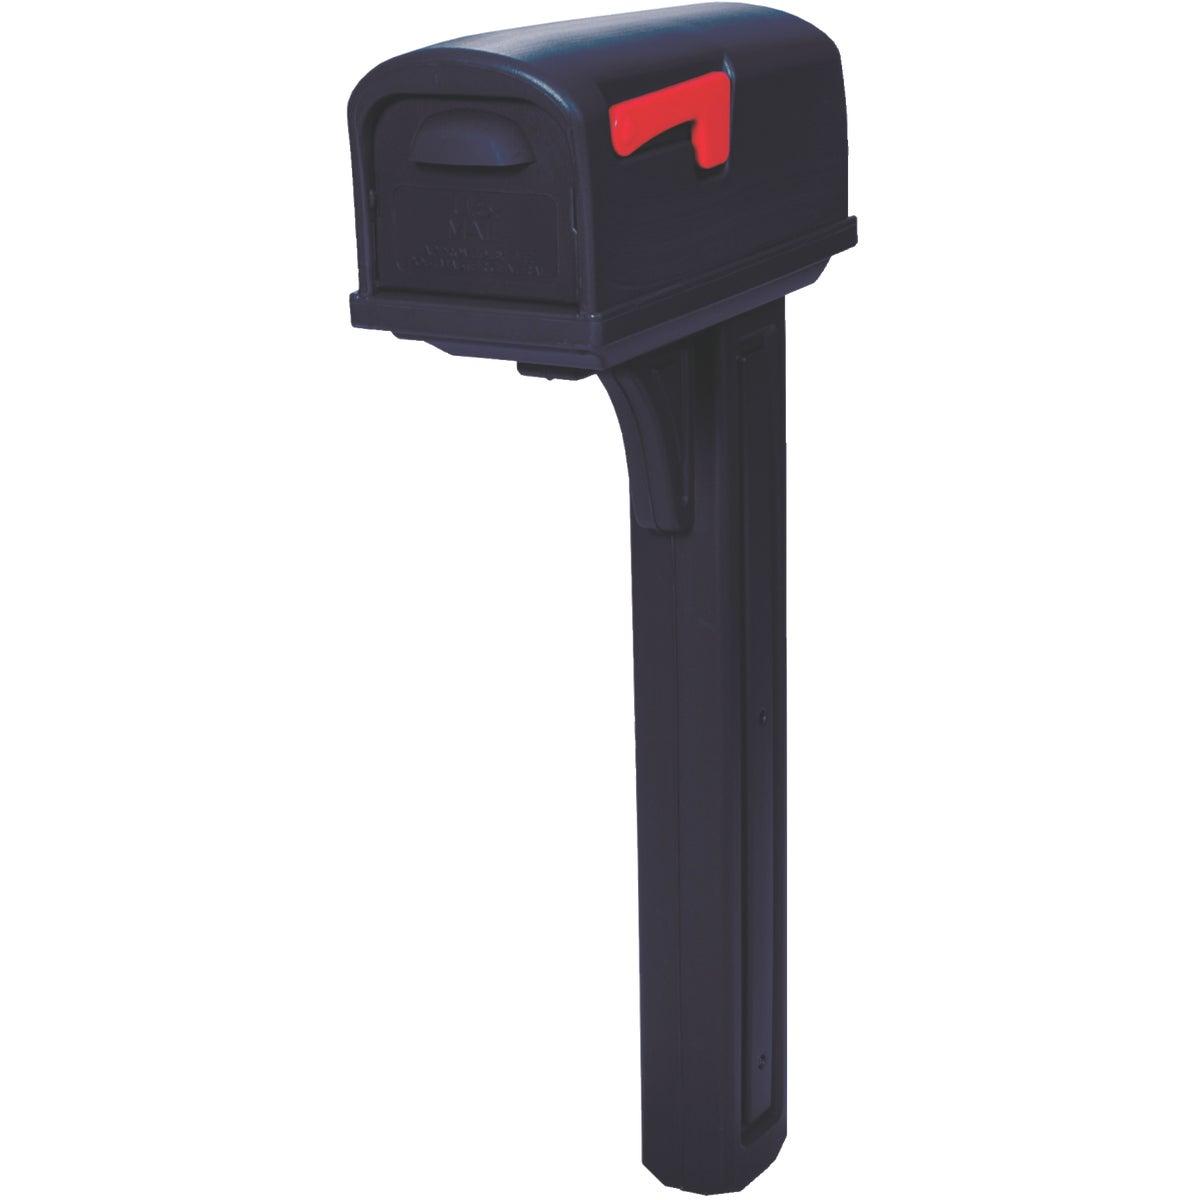 Black Combo Mailbox